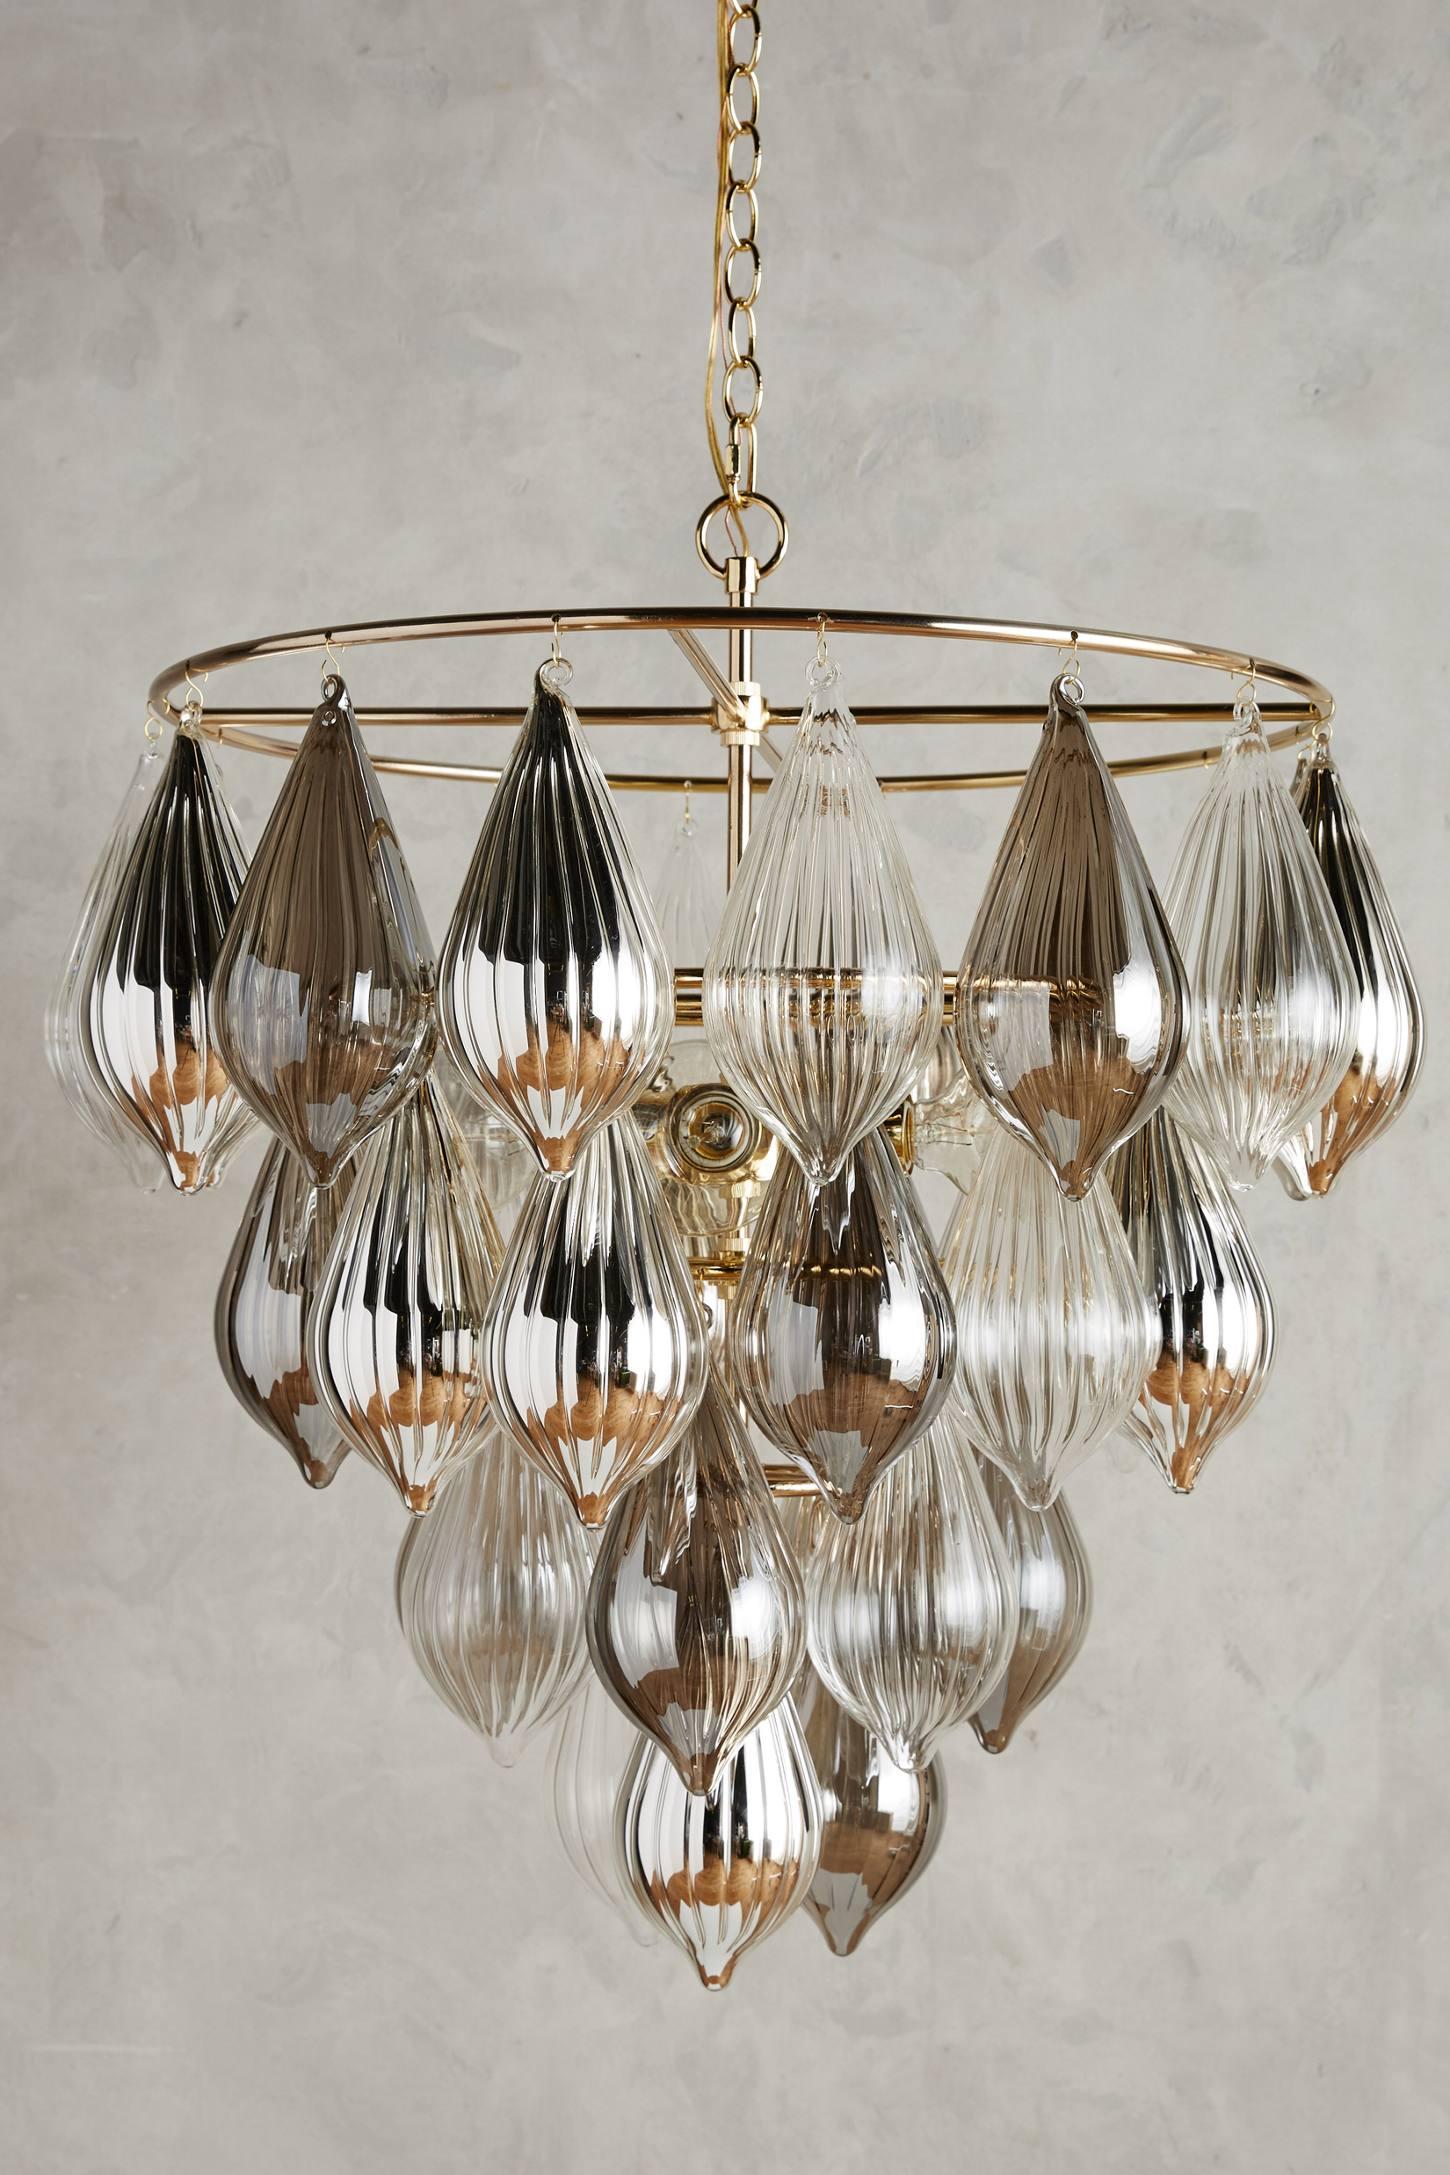 Clustered droplet chandelier anthropologie for Long ceiling light fixture